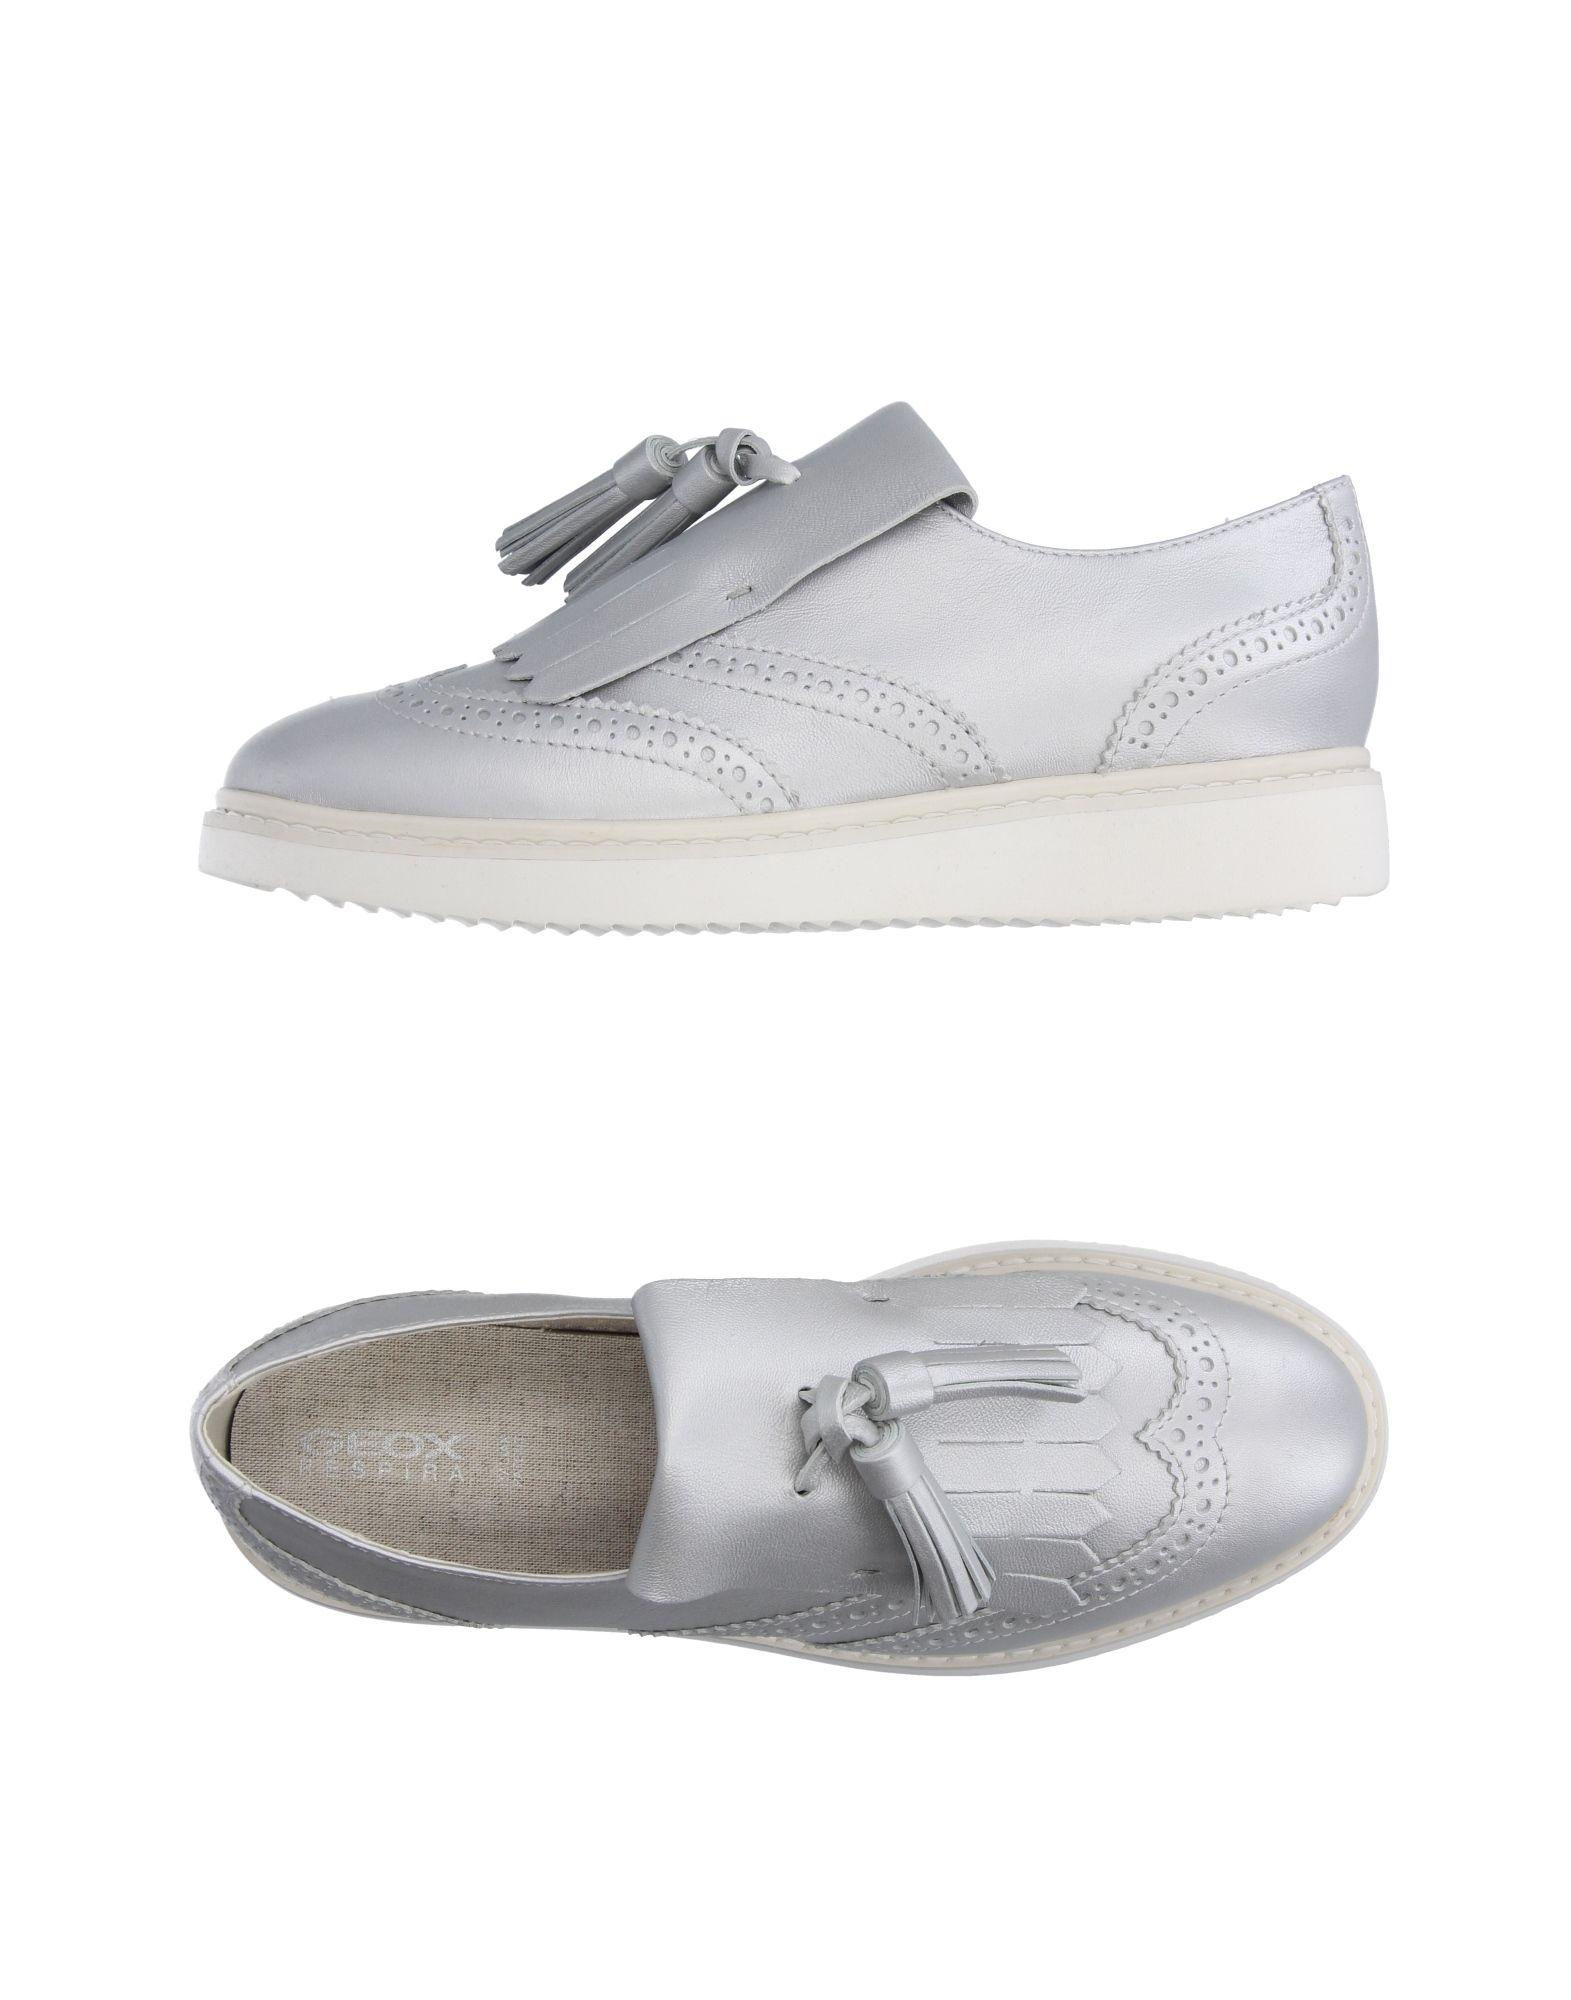 Geox Mokassins Damen Qualität 11192001AF Gute Qualität Damen beliebte Schuhe  f3de78 32aeec44f3